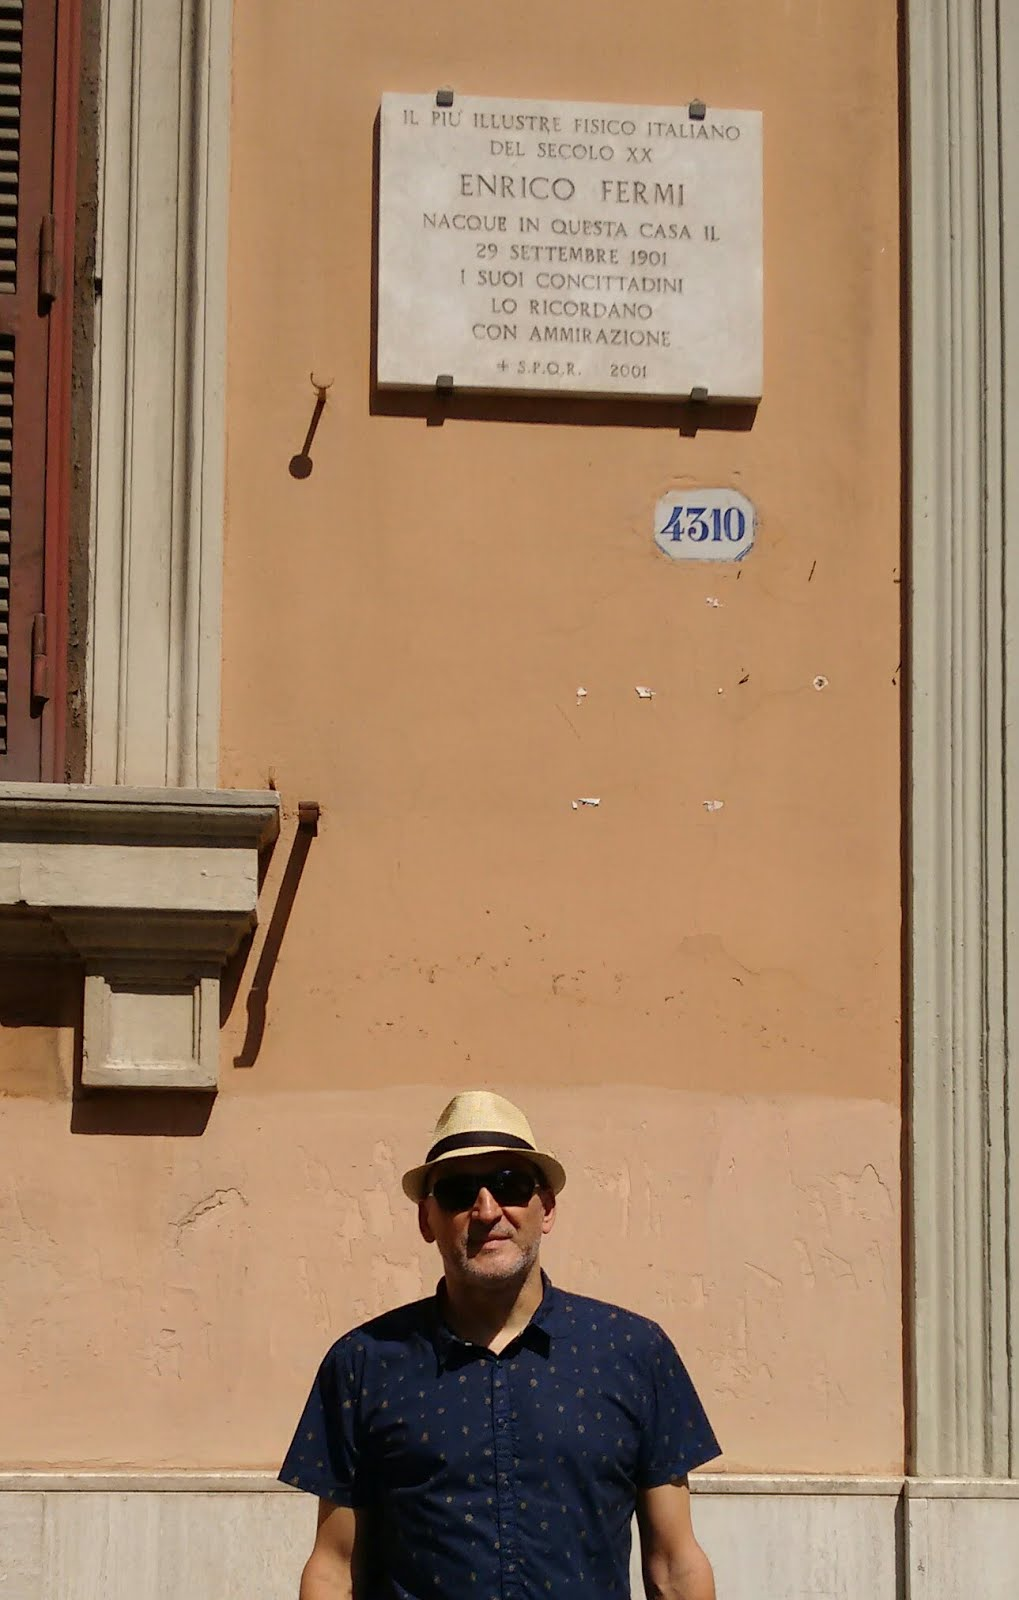 La Casa de Enrico Fermi